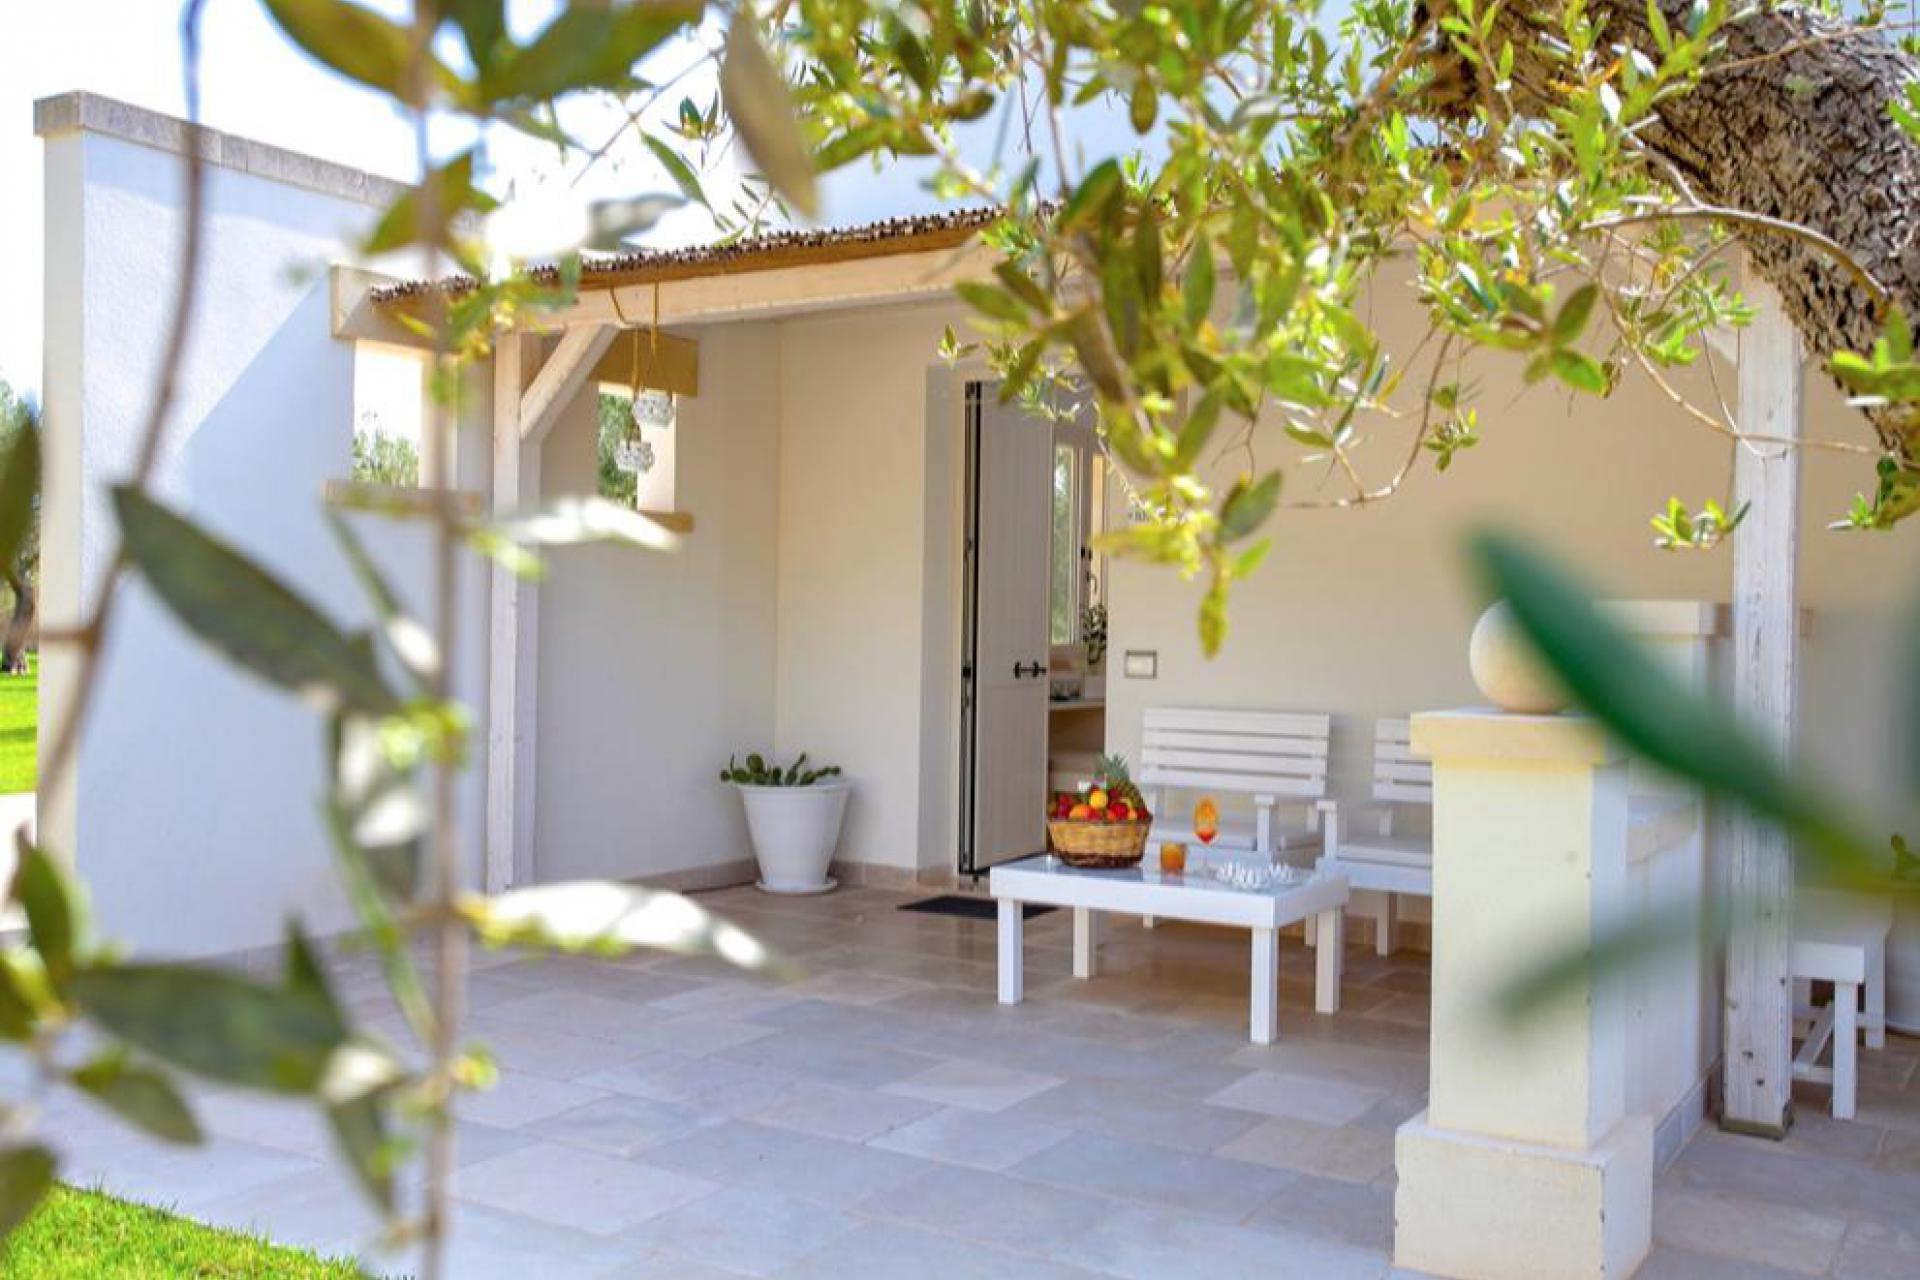 Agriturismo Puglia Agriturismo in Puglia, lusso e ospitalità